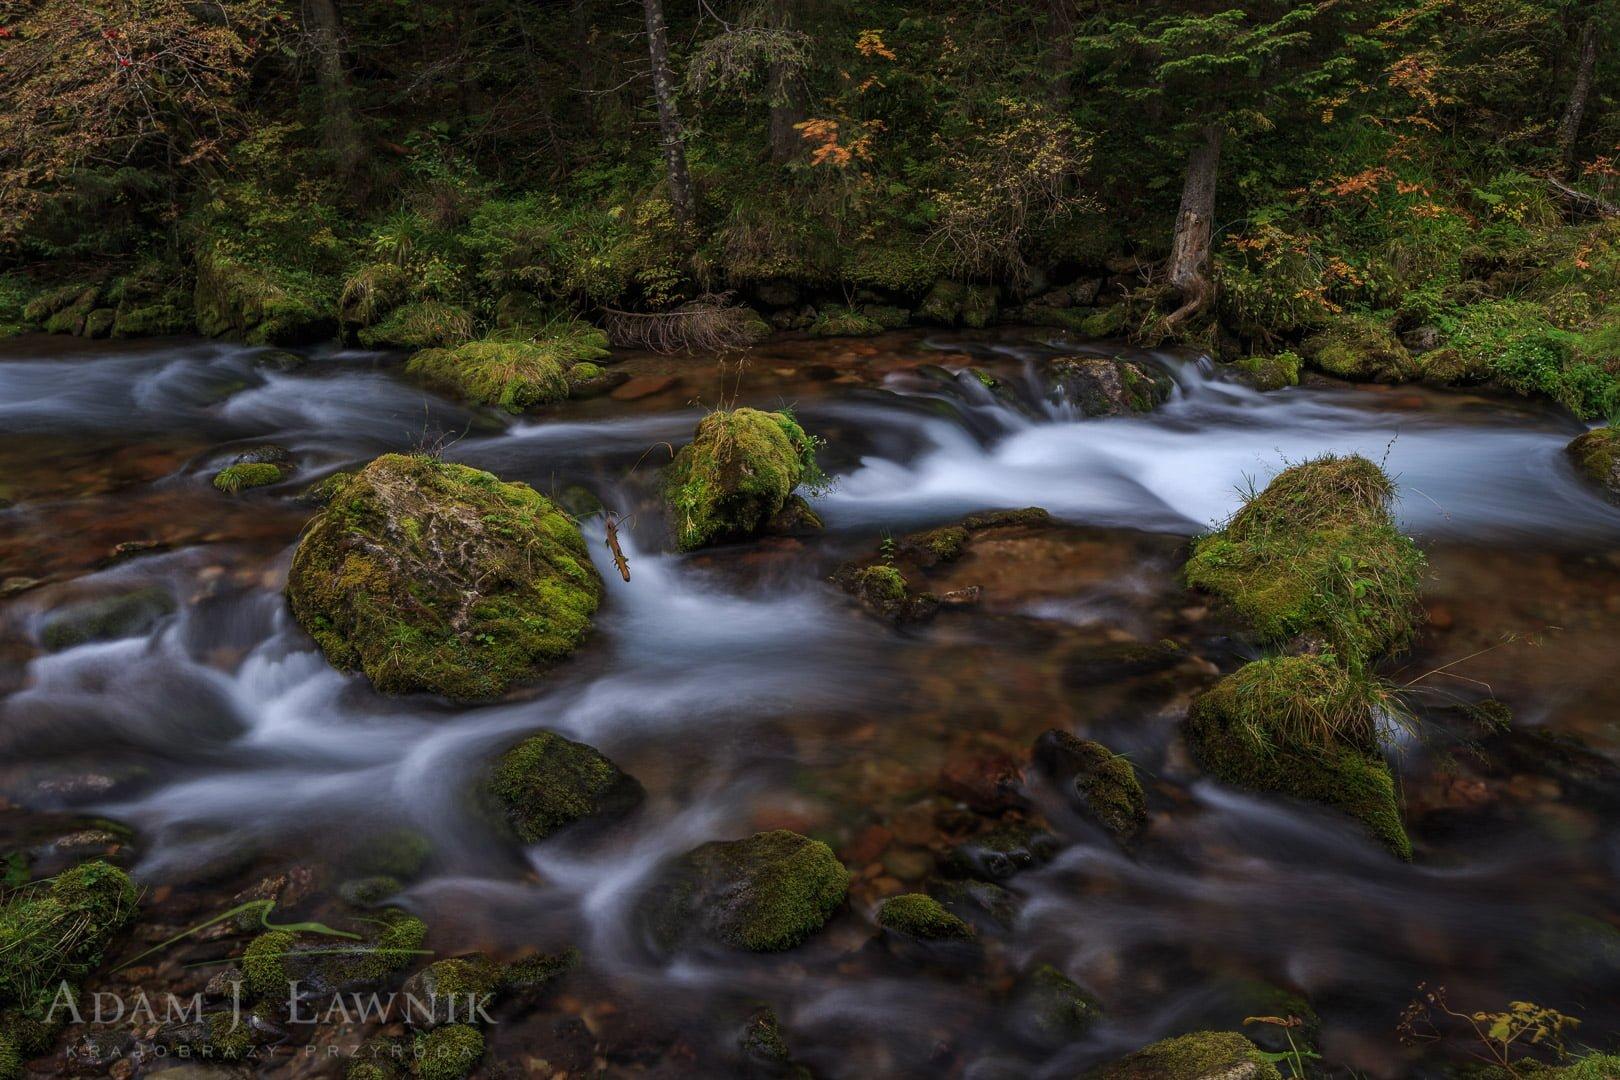 Tatra National Park, Poland 1310-01201C